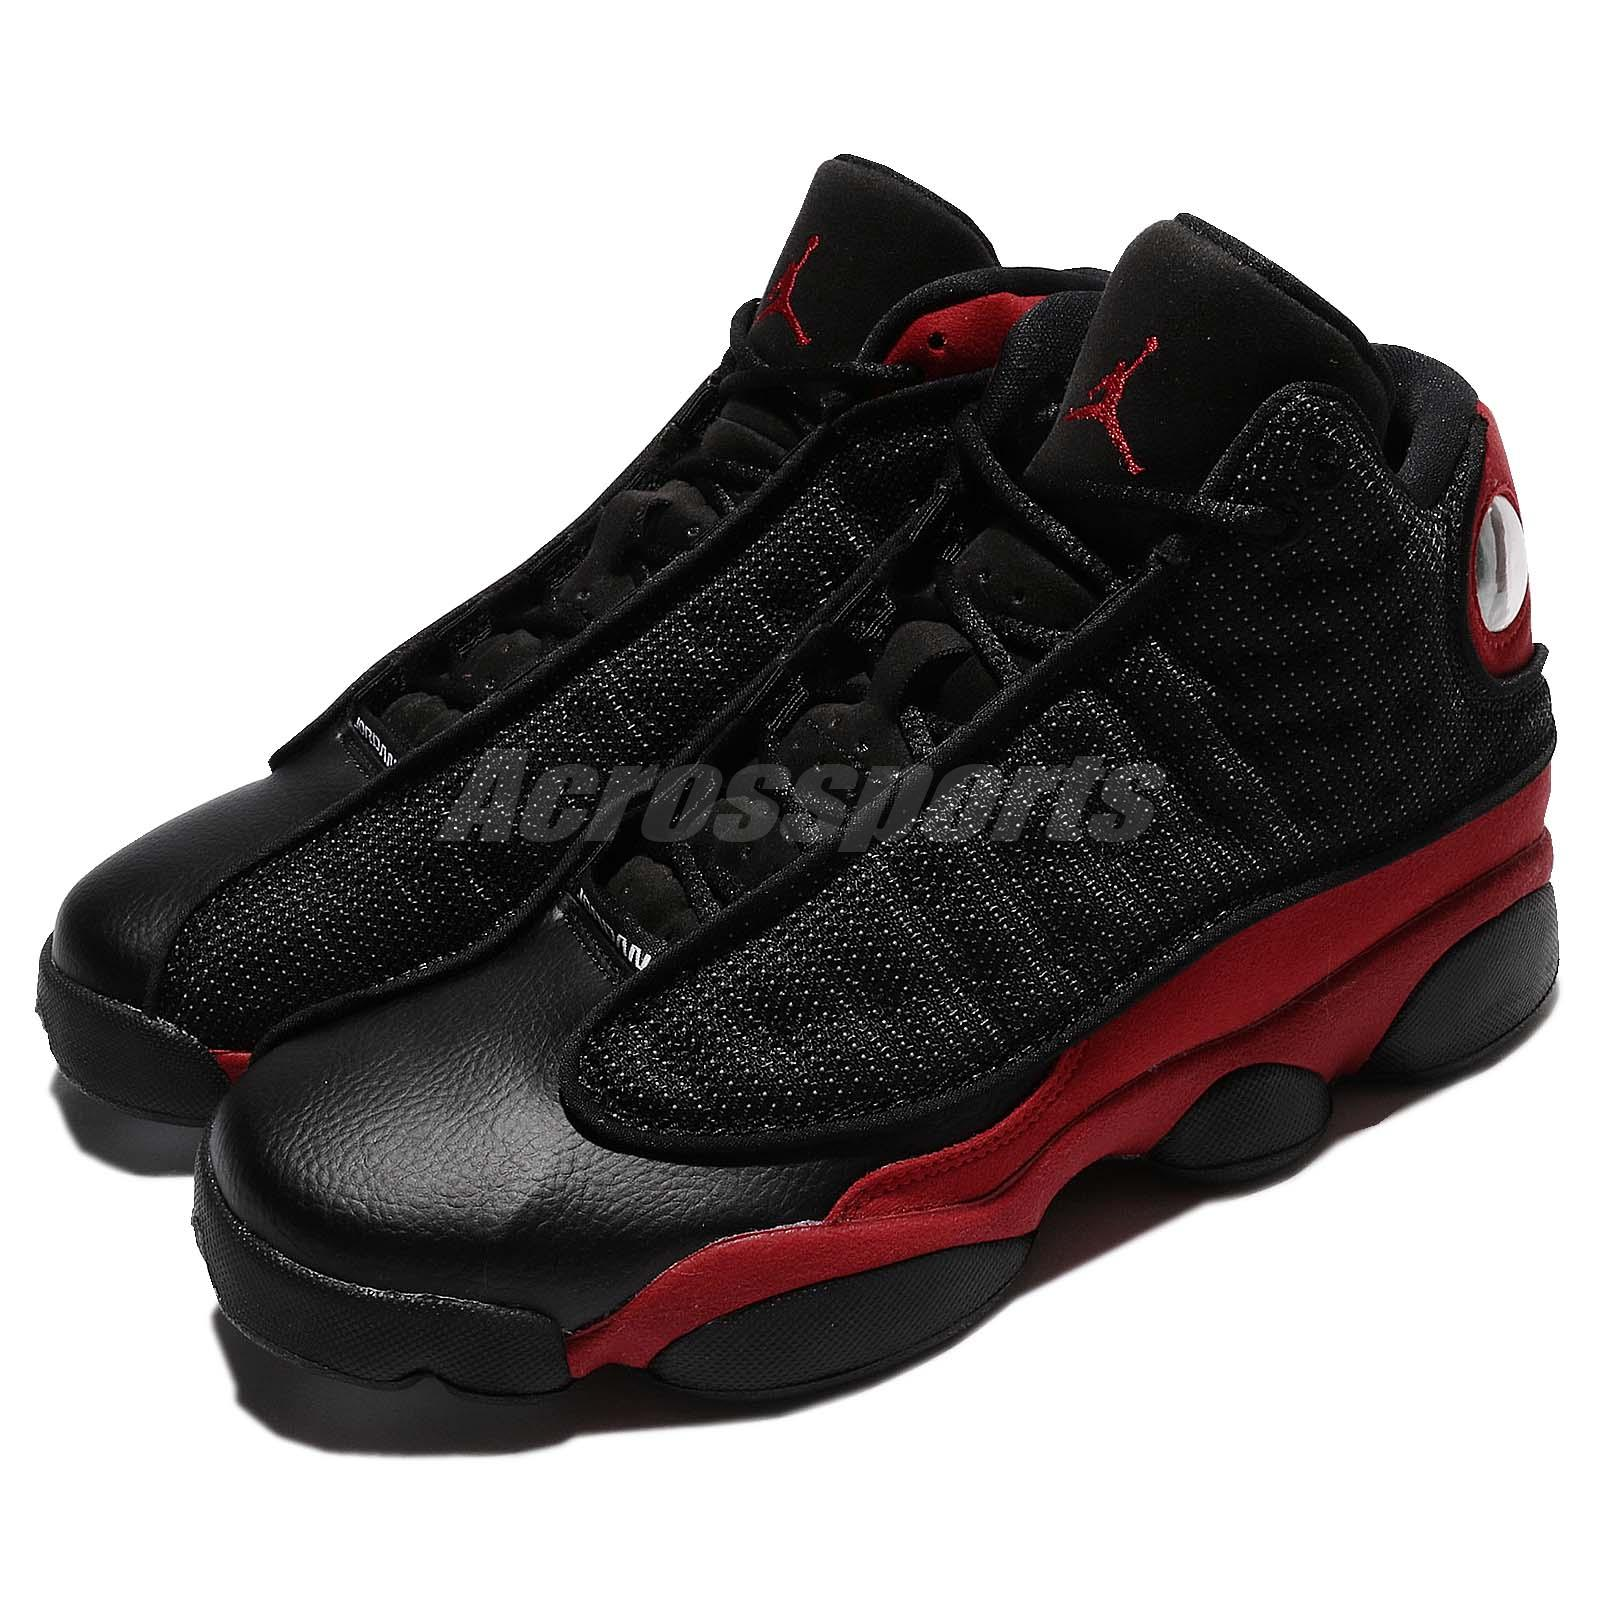 Details about Nike Air Jordan 13 XIII Retro BG GS OG Bred Black Red AJ13  Kid Women 414574-004 92ce728cdc8c